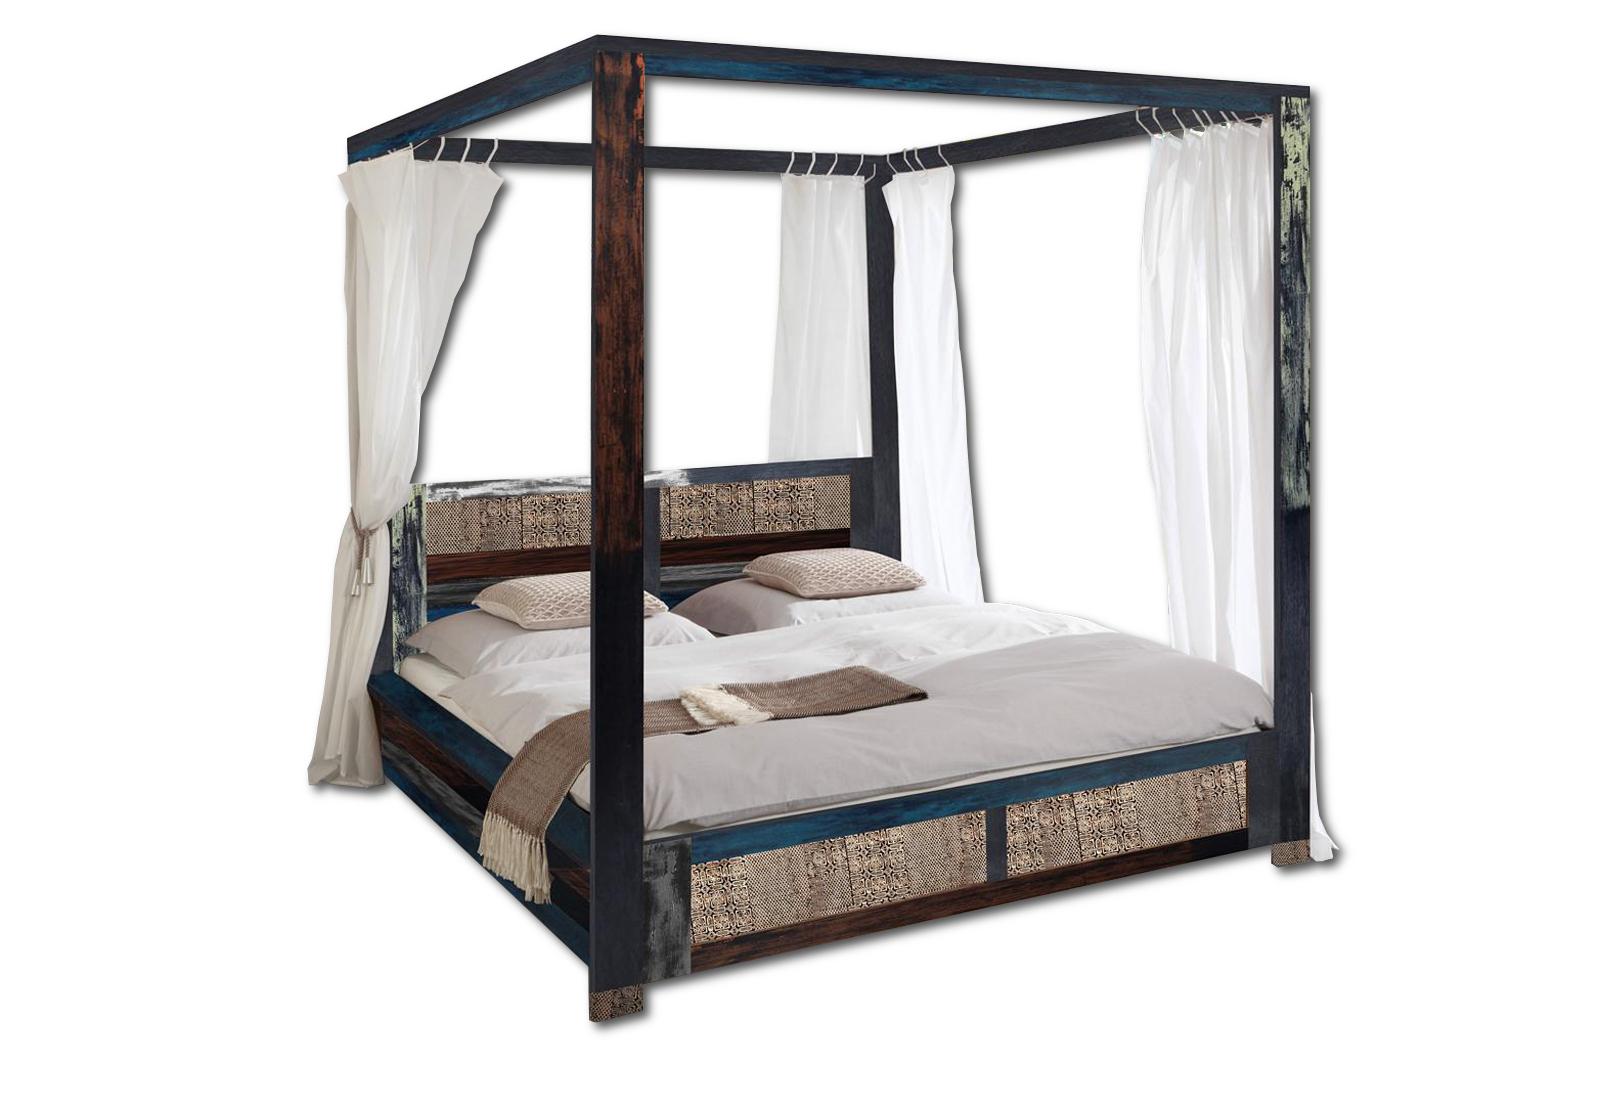 sam vintage himmelbett holzbett metall 160 x 200 cm bunt goa. Black Bedroom Furniture Sets. Home Design Ideas